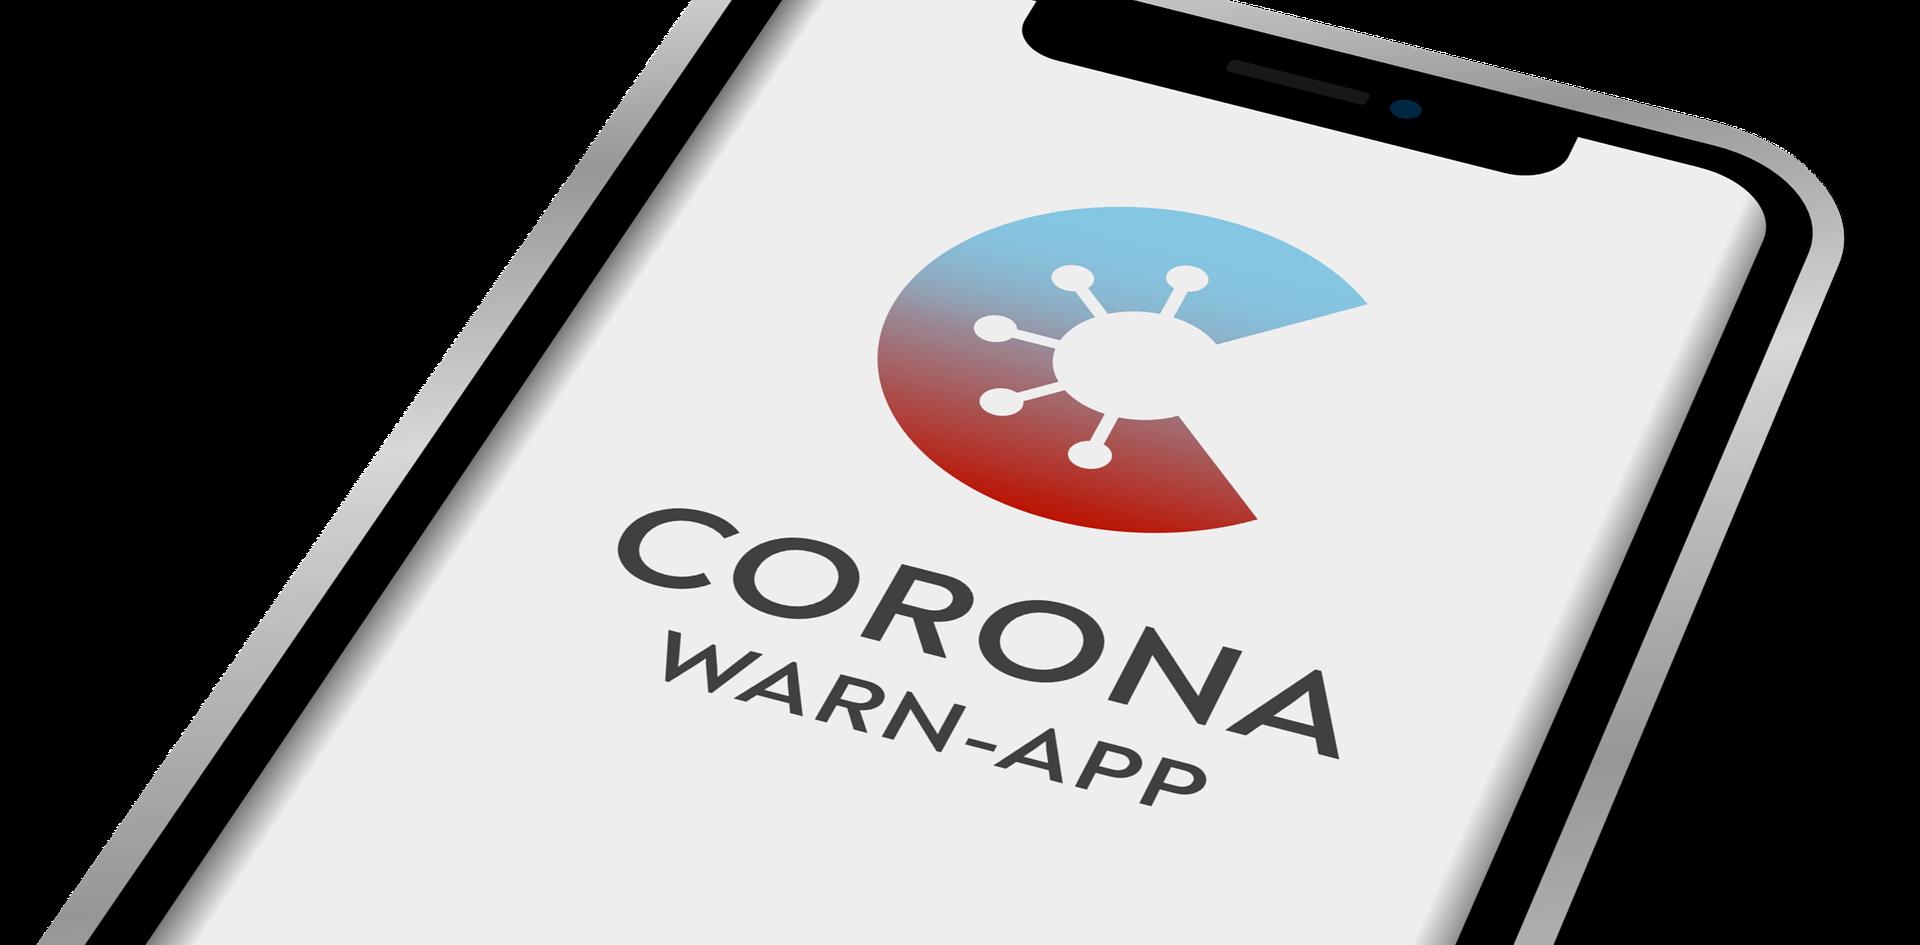 Corona-App Installation